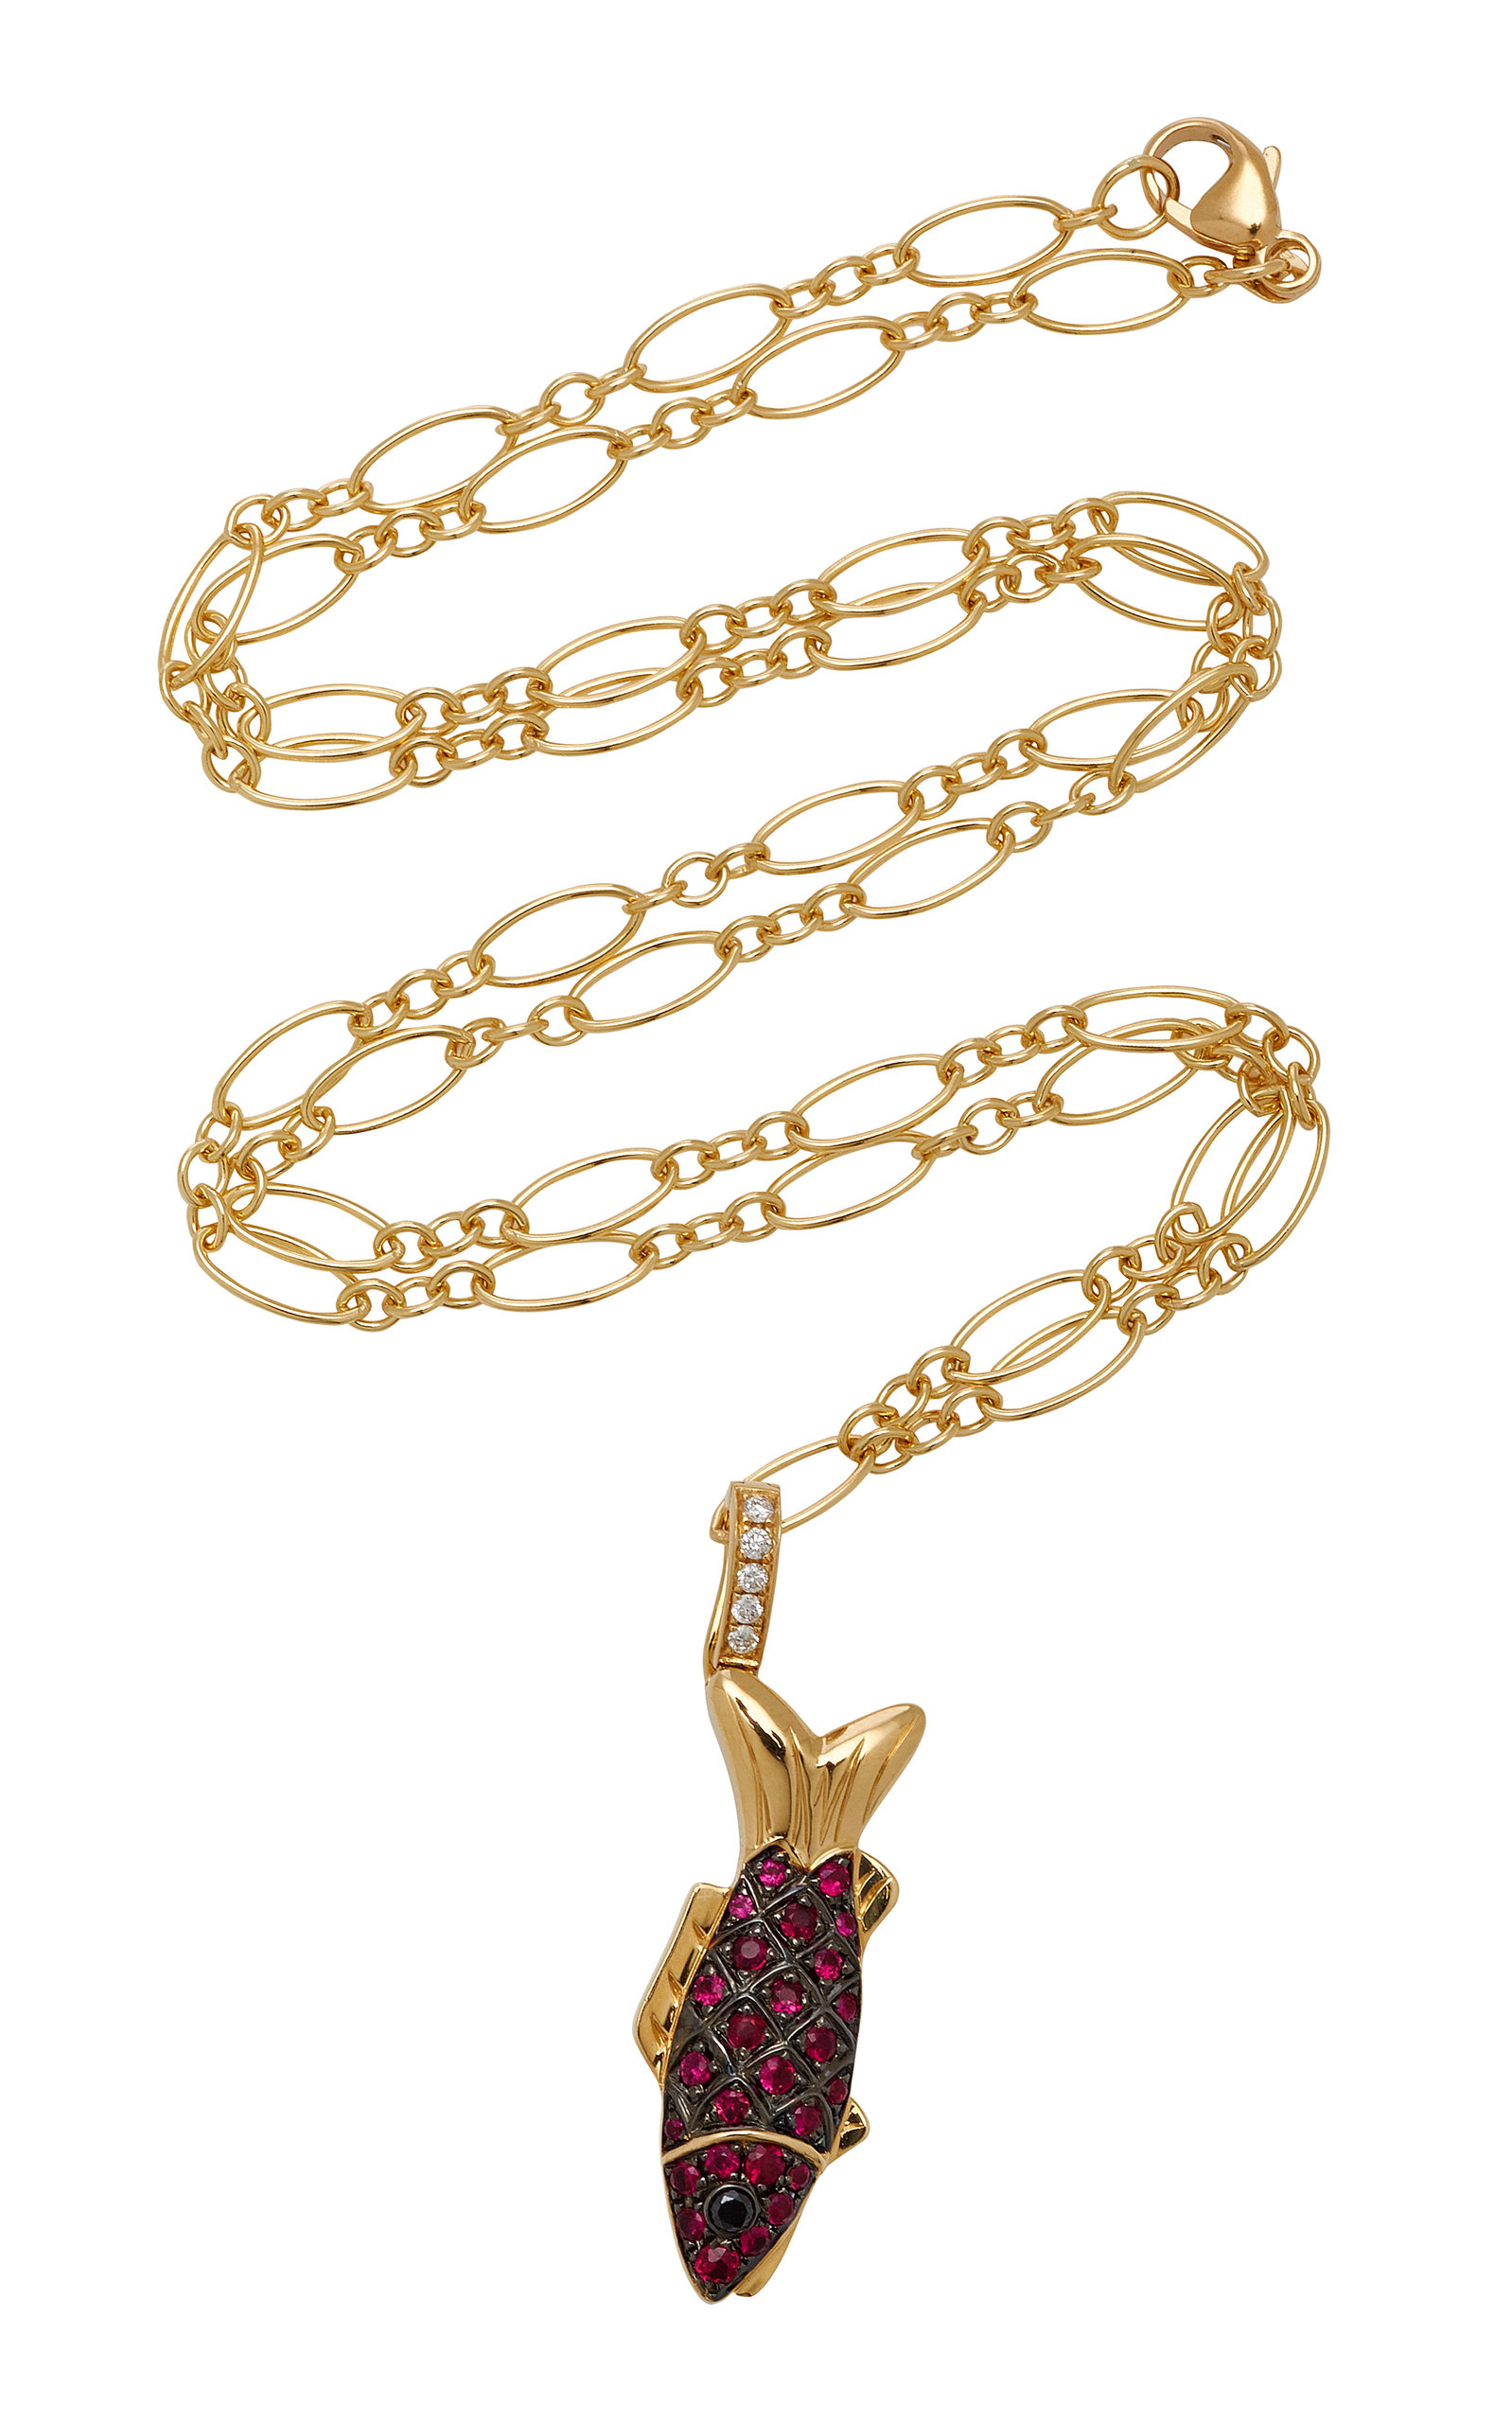 KHAI KHAI 18K Gold Diamonds And Rubies Charm in Red